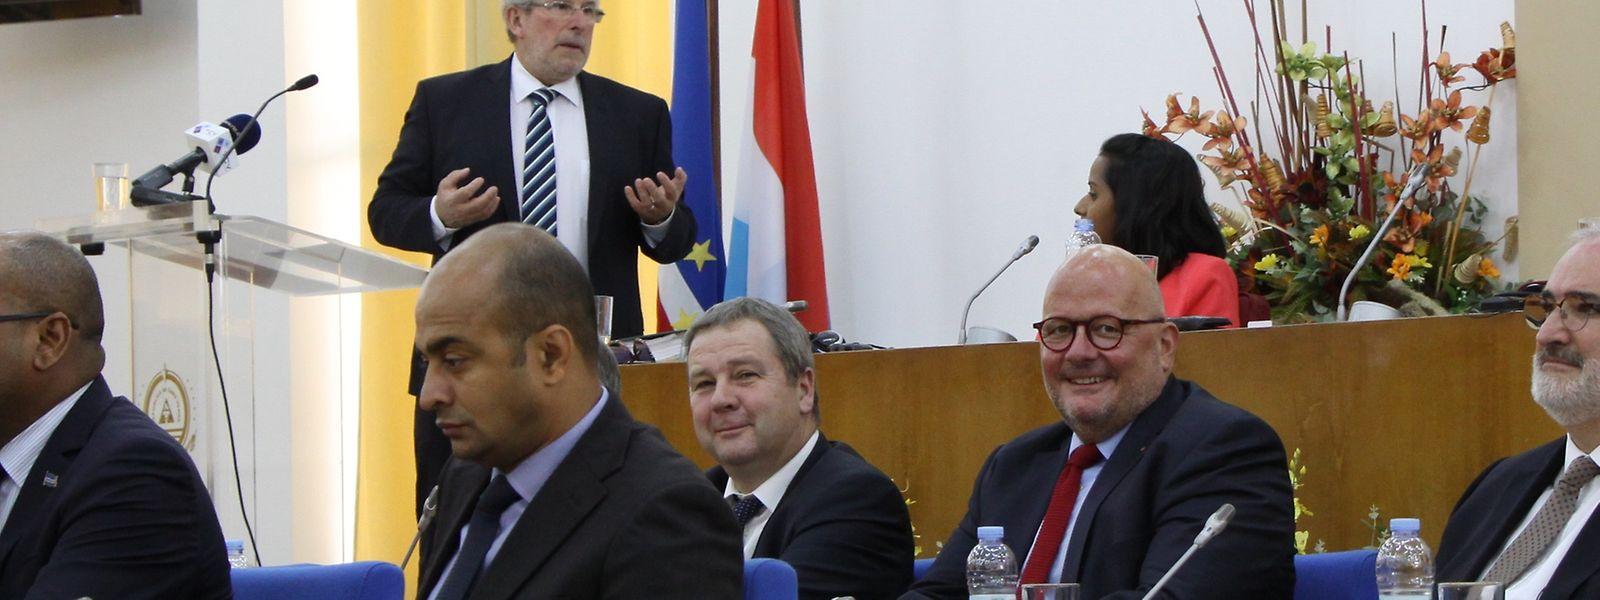 Mars di Bartolomeo, durante o discurso na Assembleia Nacional de Cabo Verde.